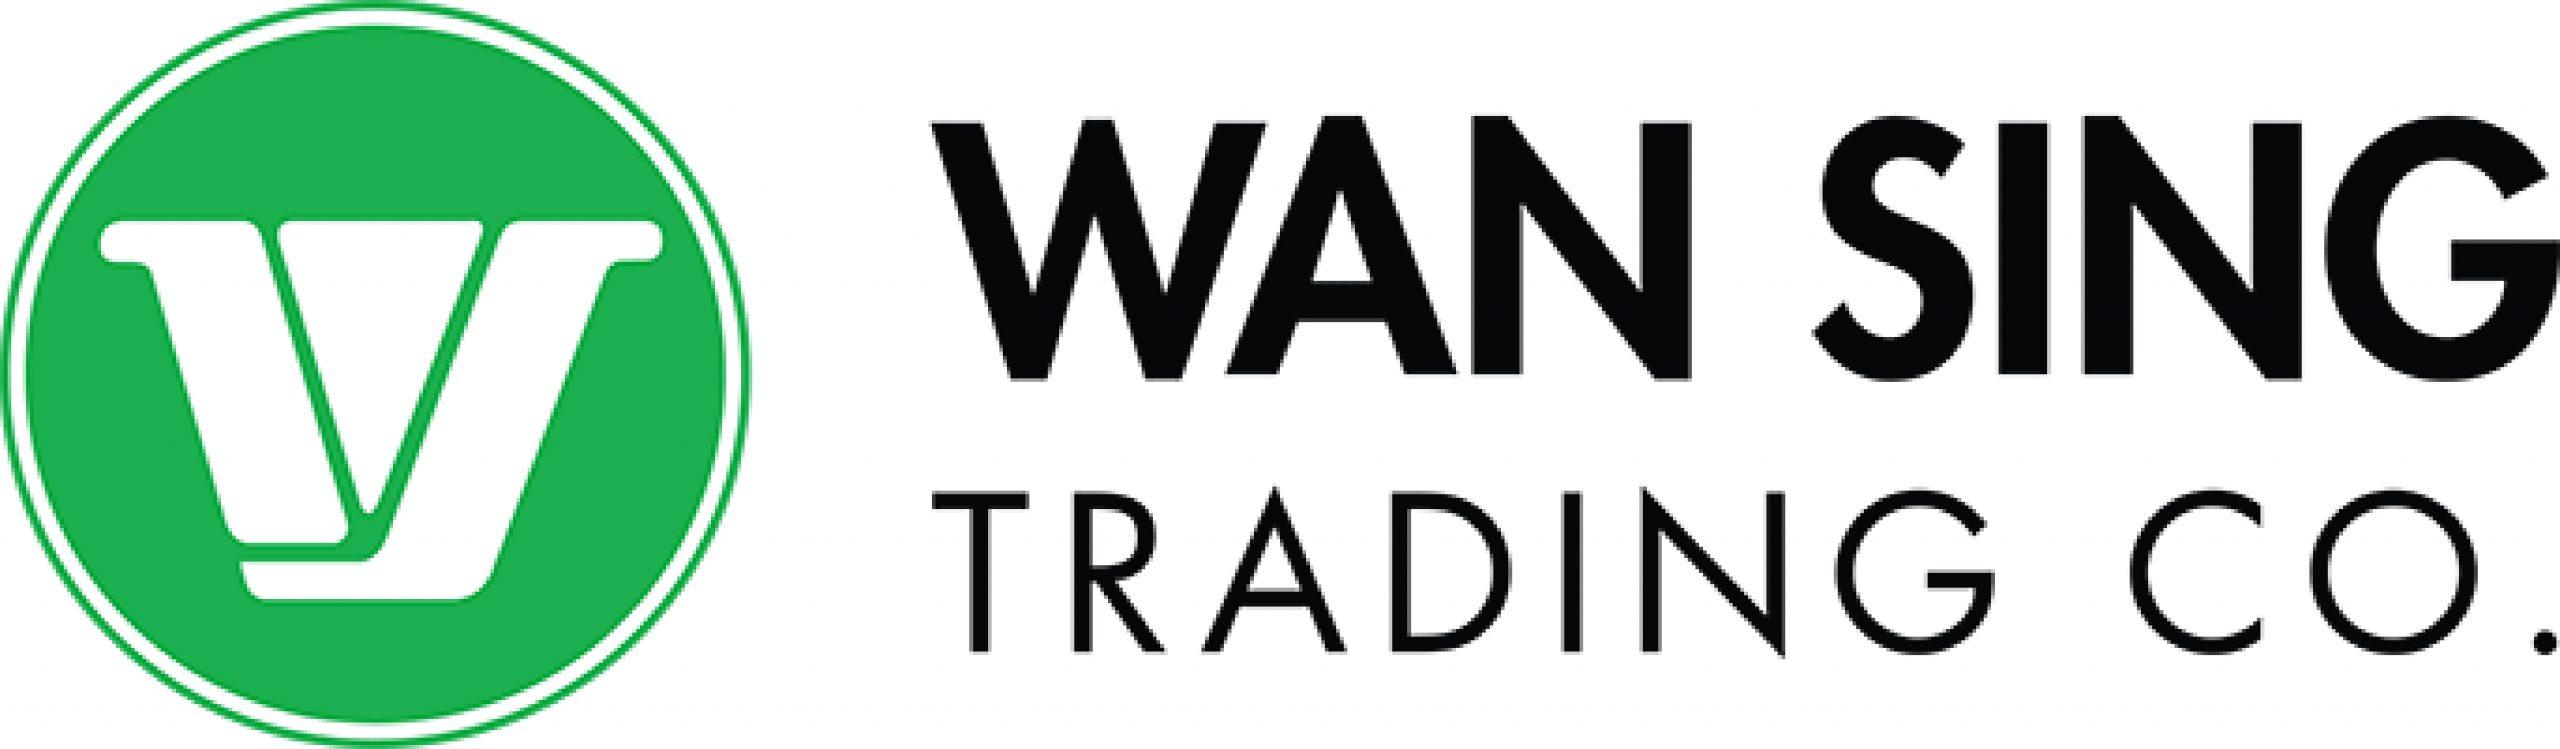 Wan Sing Trading Company